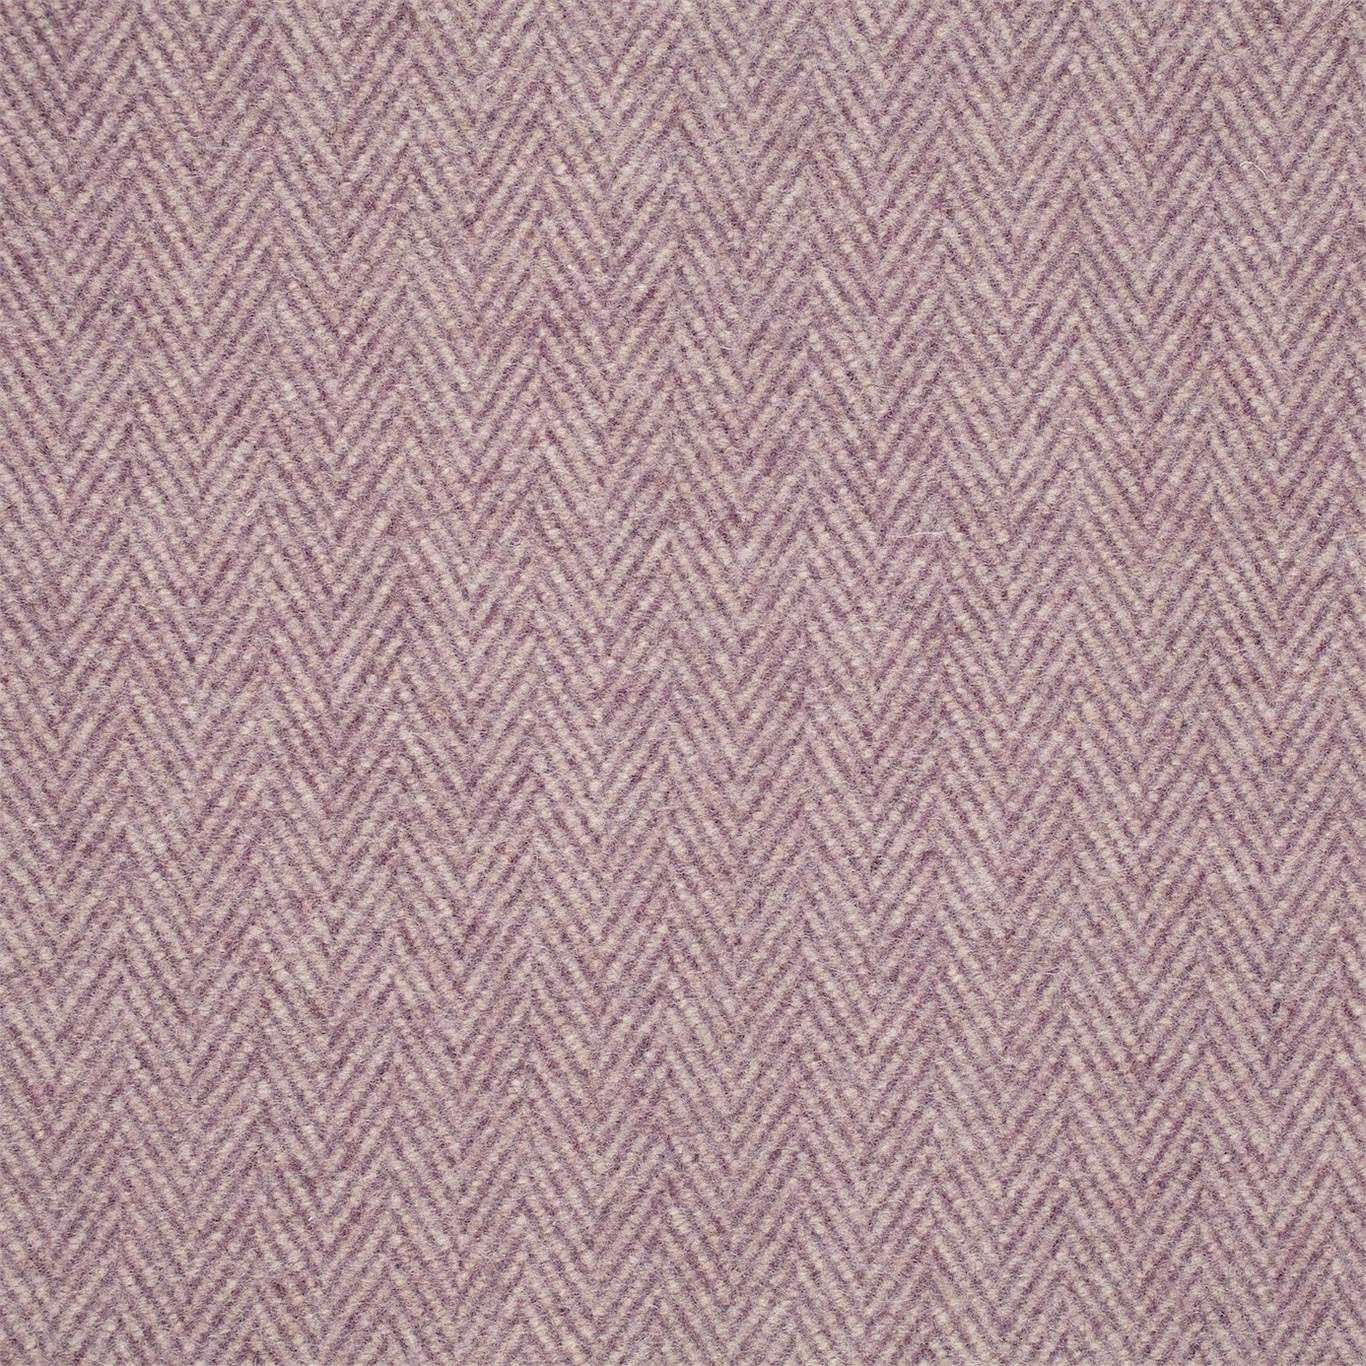 Image of Sanderson Portland Heather Fabric 233232